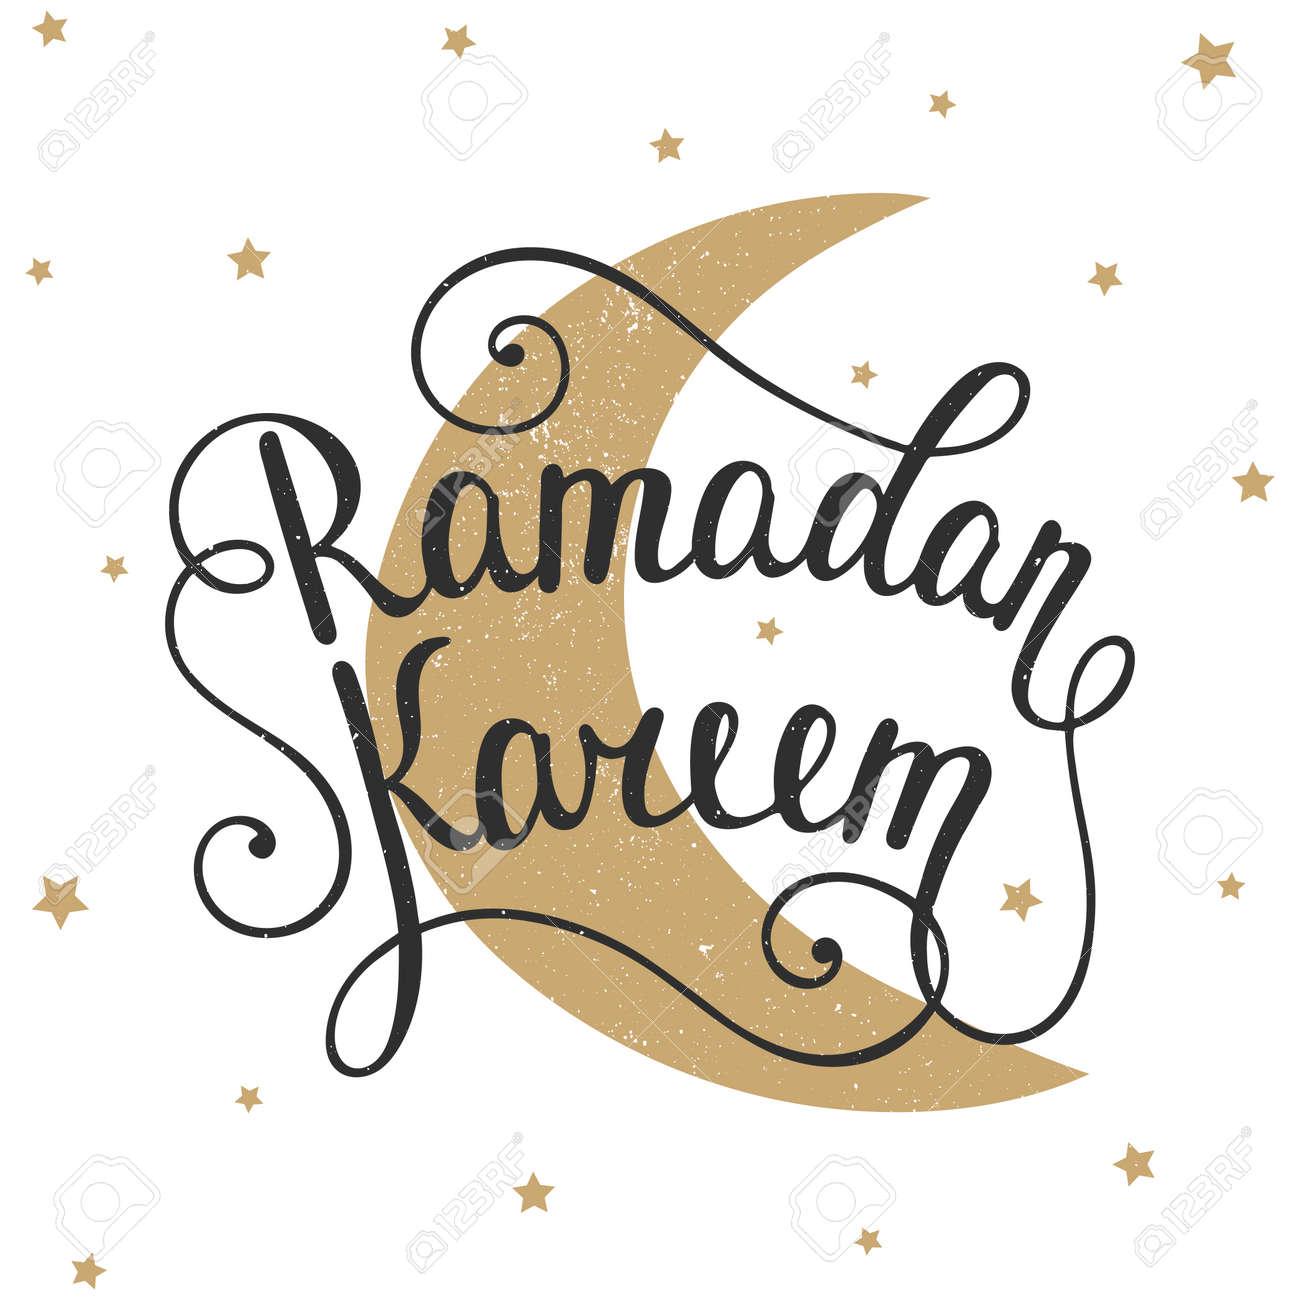 ramadan kareem greeting card design template with modern calligraphy